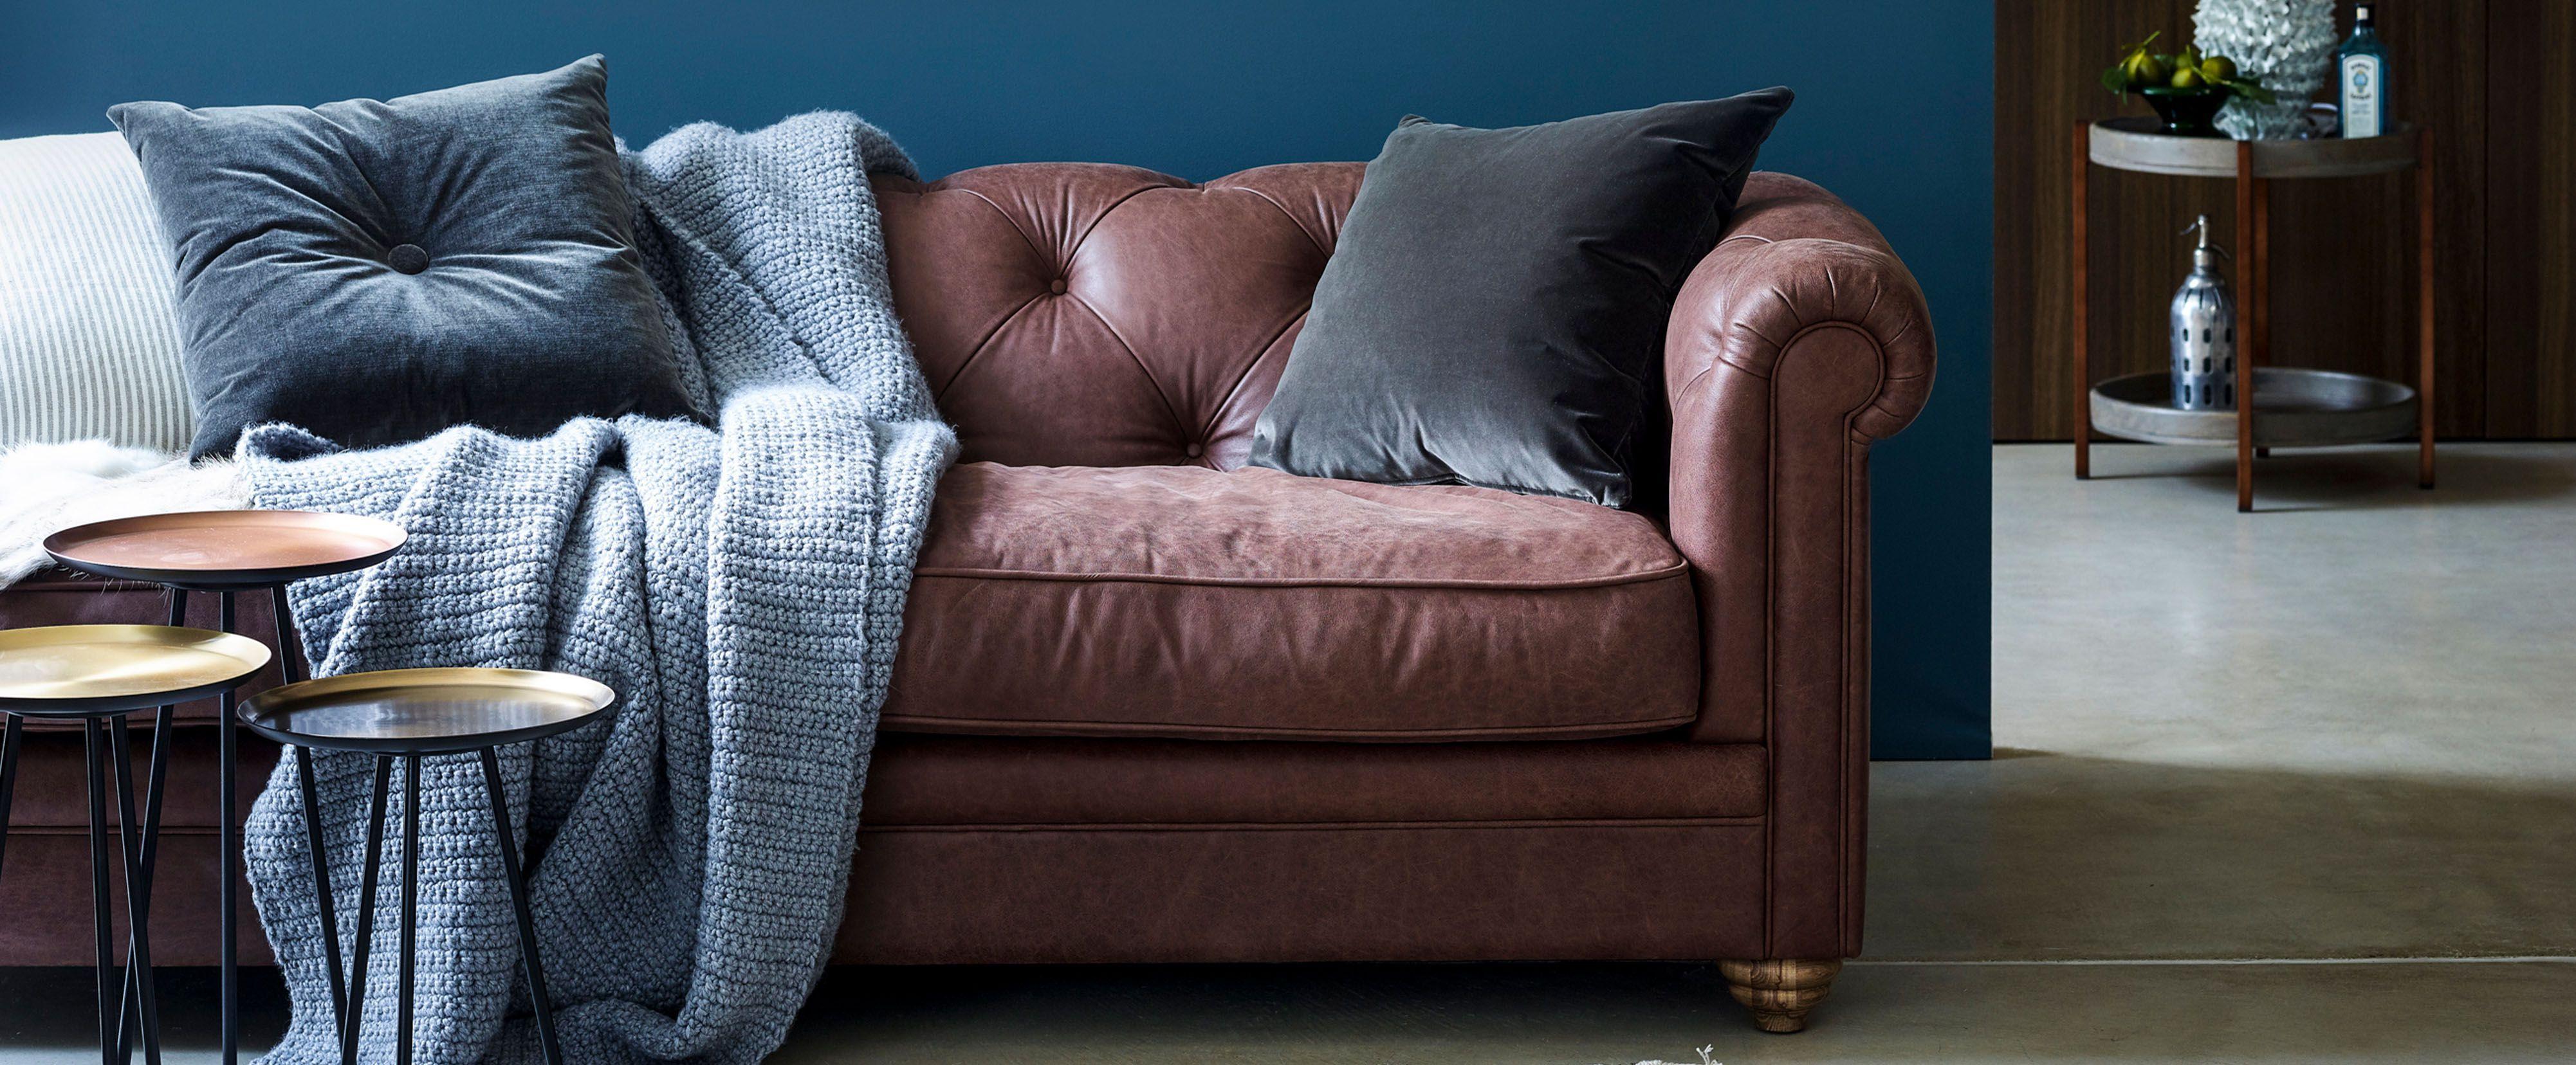 leather-sofas.jpg